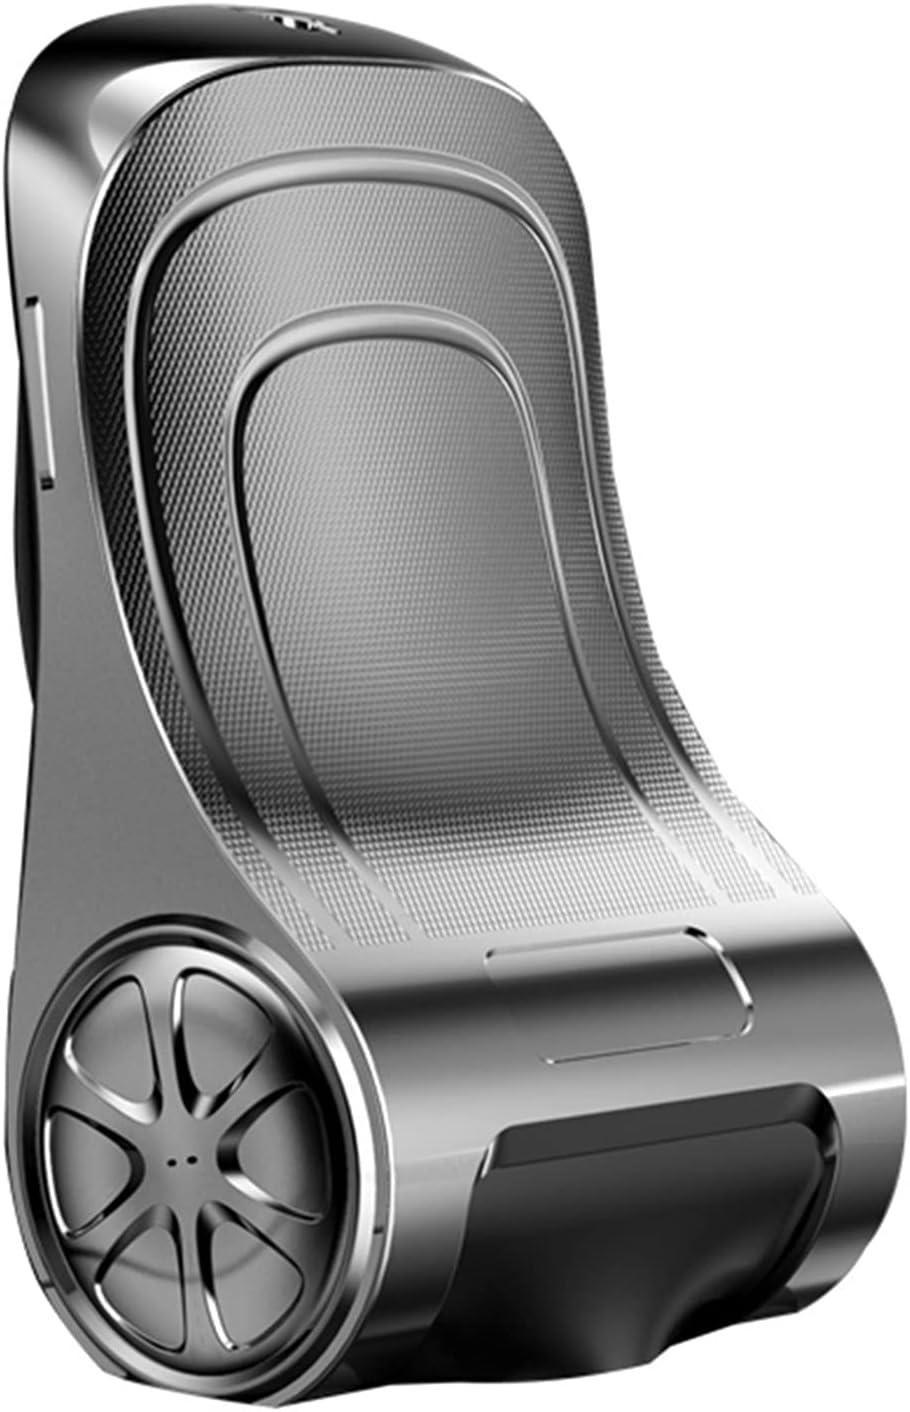 ilikfe Radar Detector Dashboard Cam D Night Rapid rise Car Vision DVR Max 63% OFF